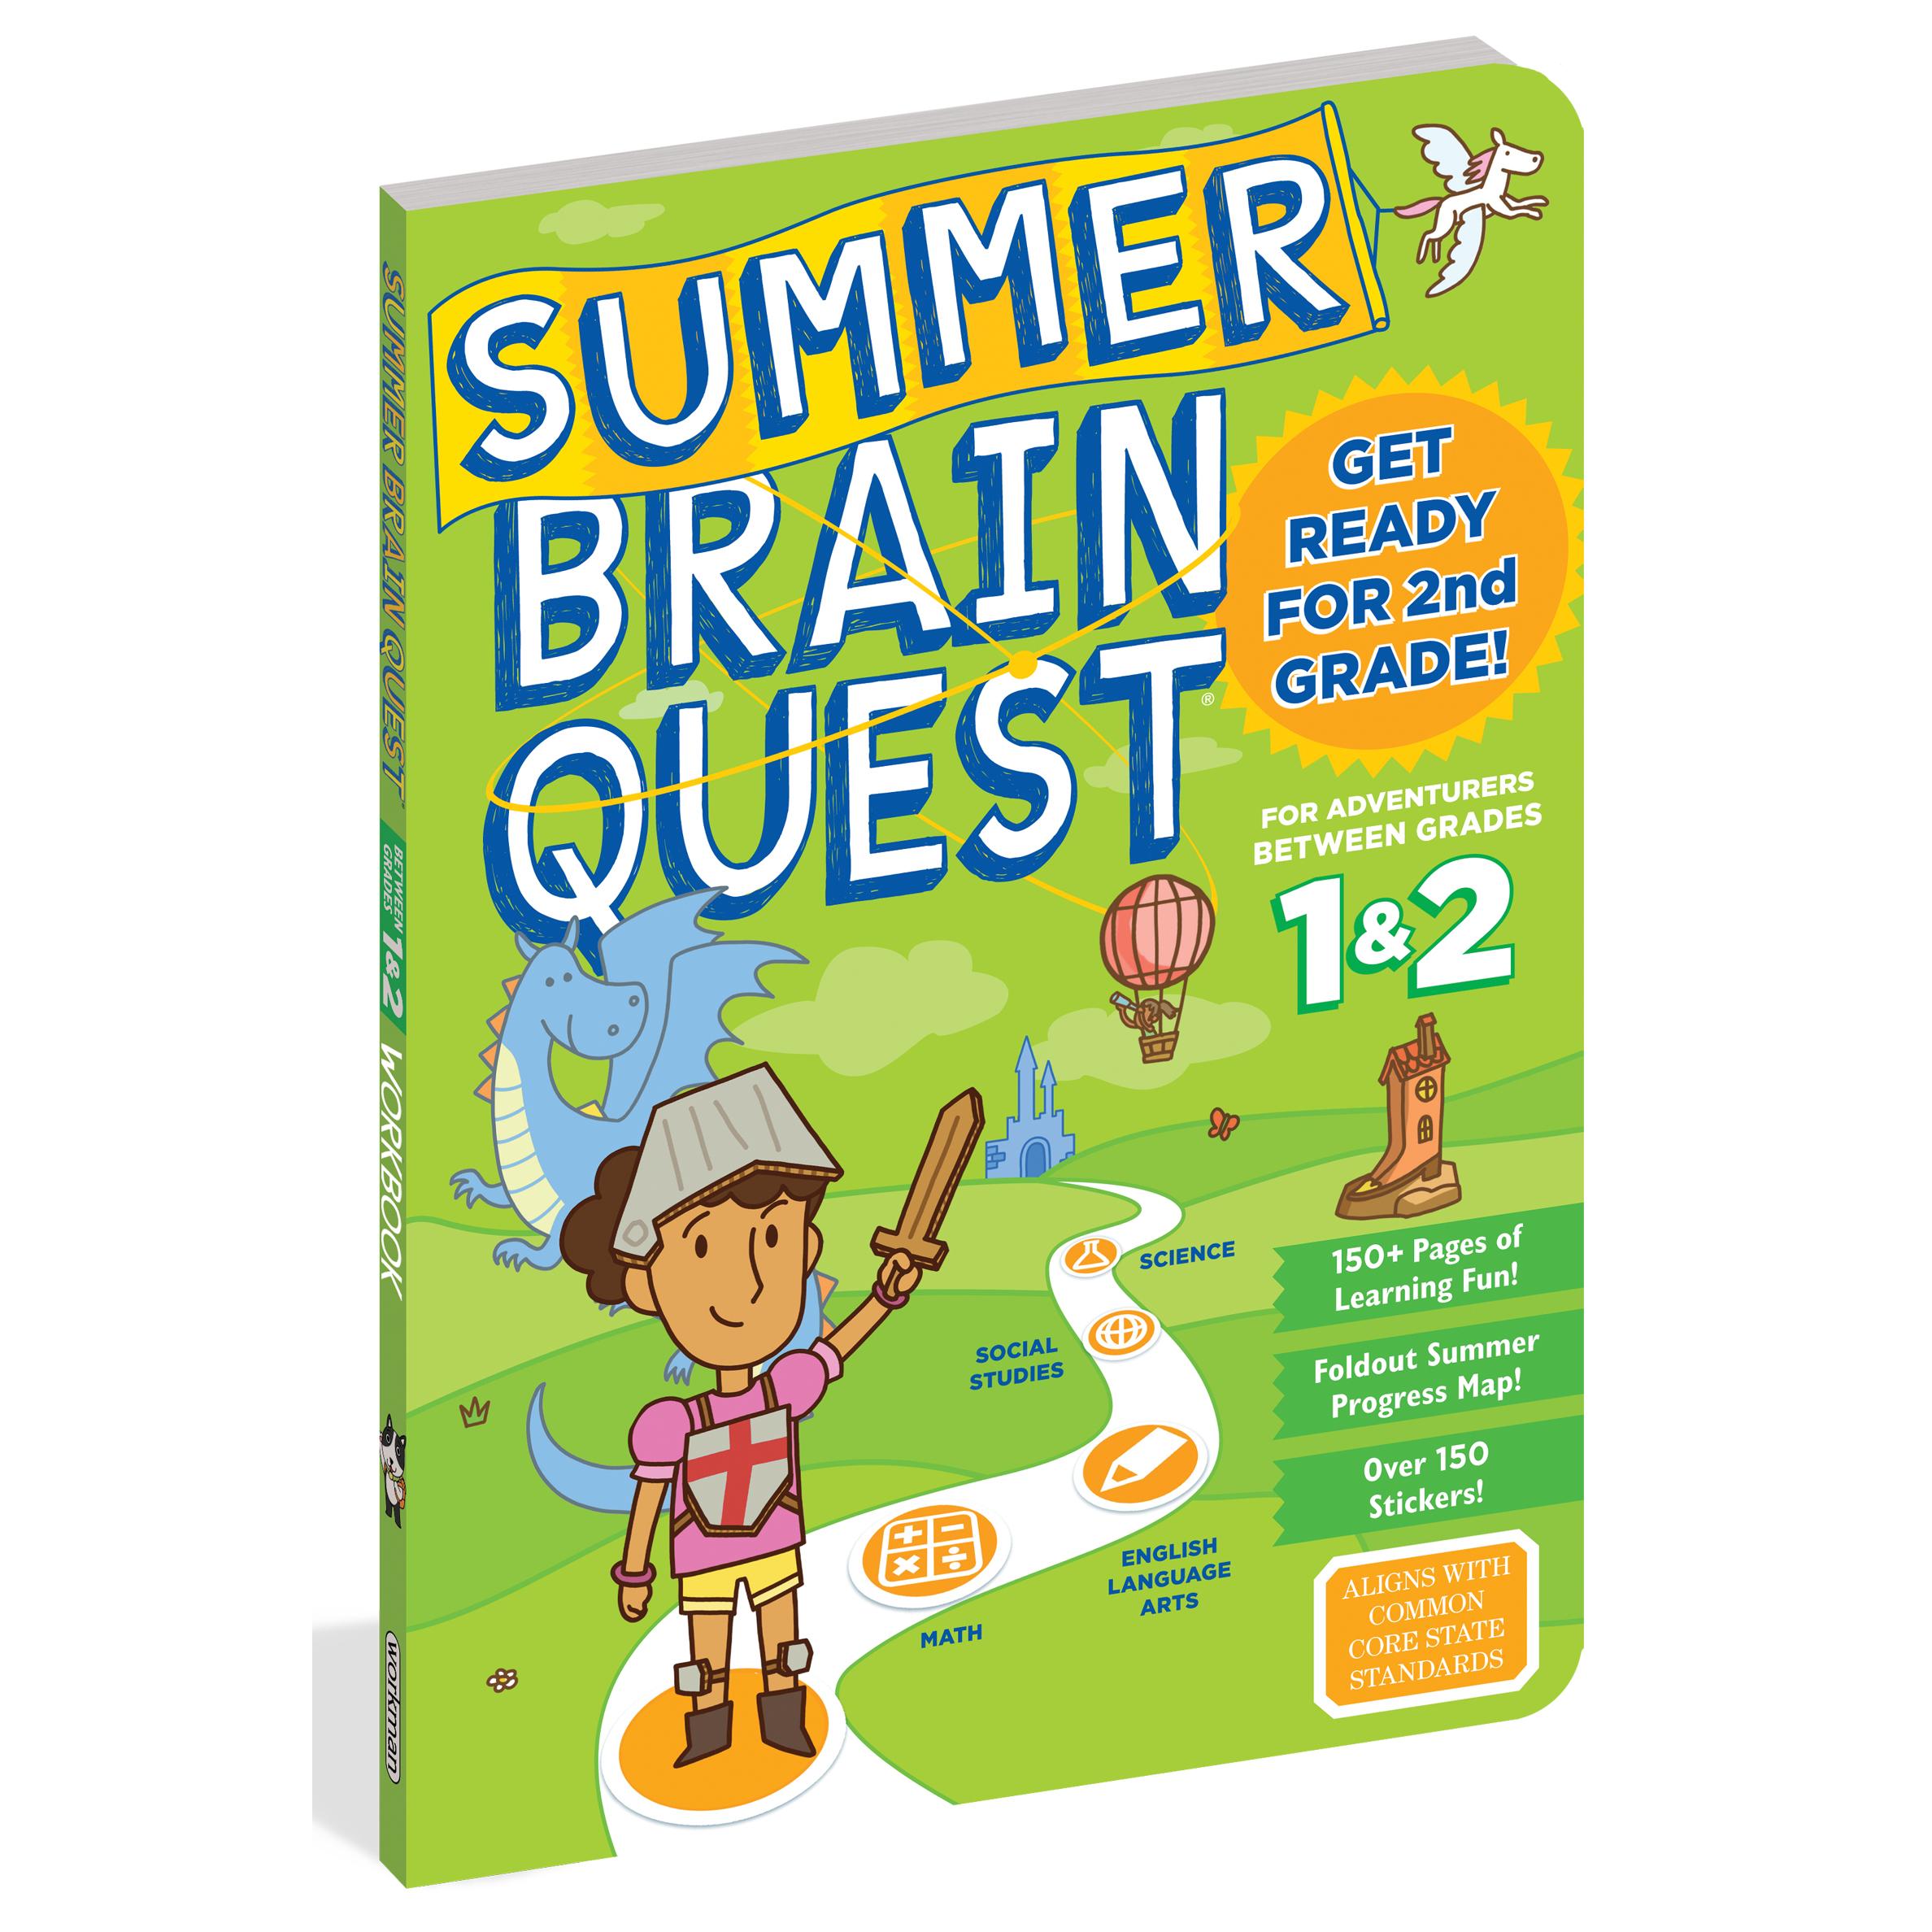 Summer Brain Quest Get ready for 2nd Grade! 1